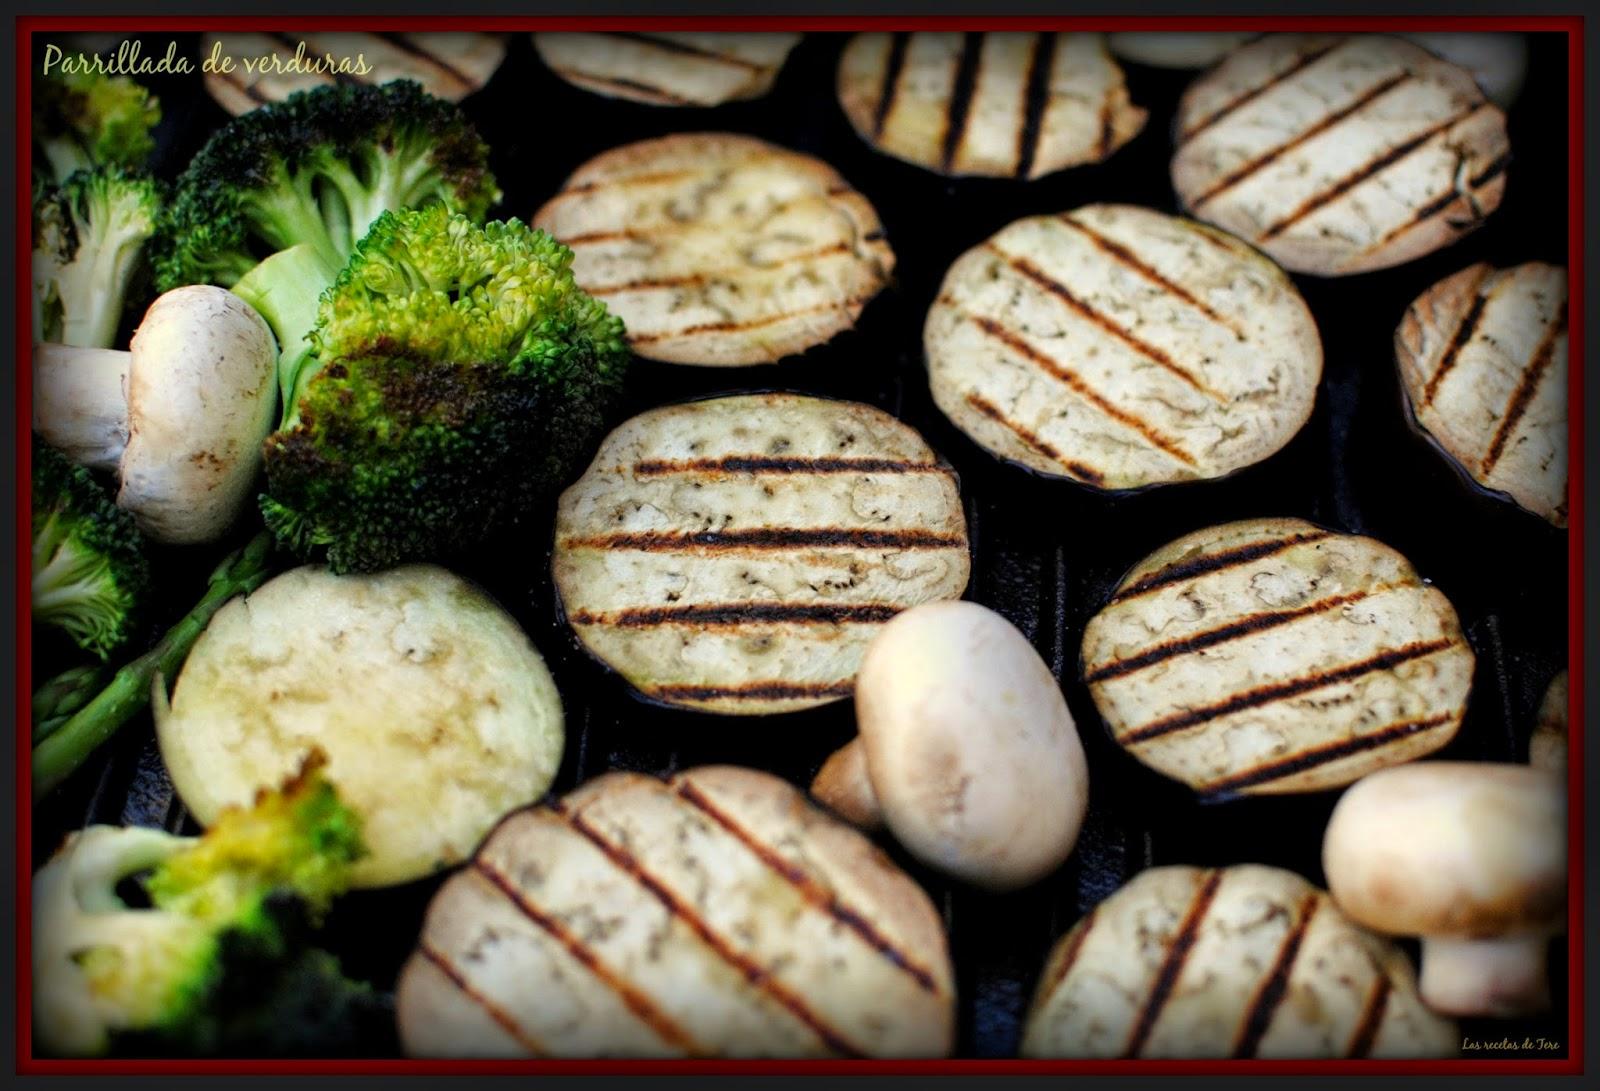 parrillada de verduras tererecetas 05